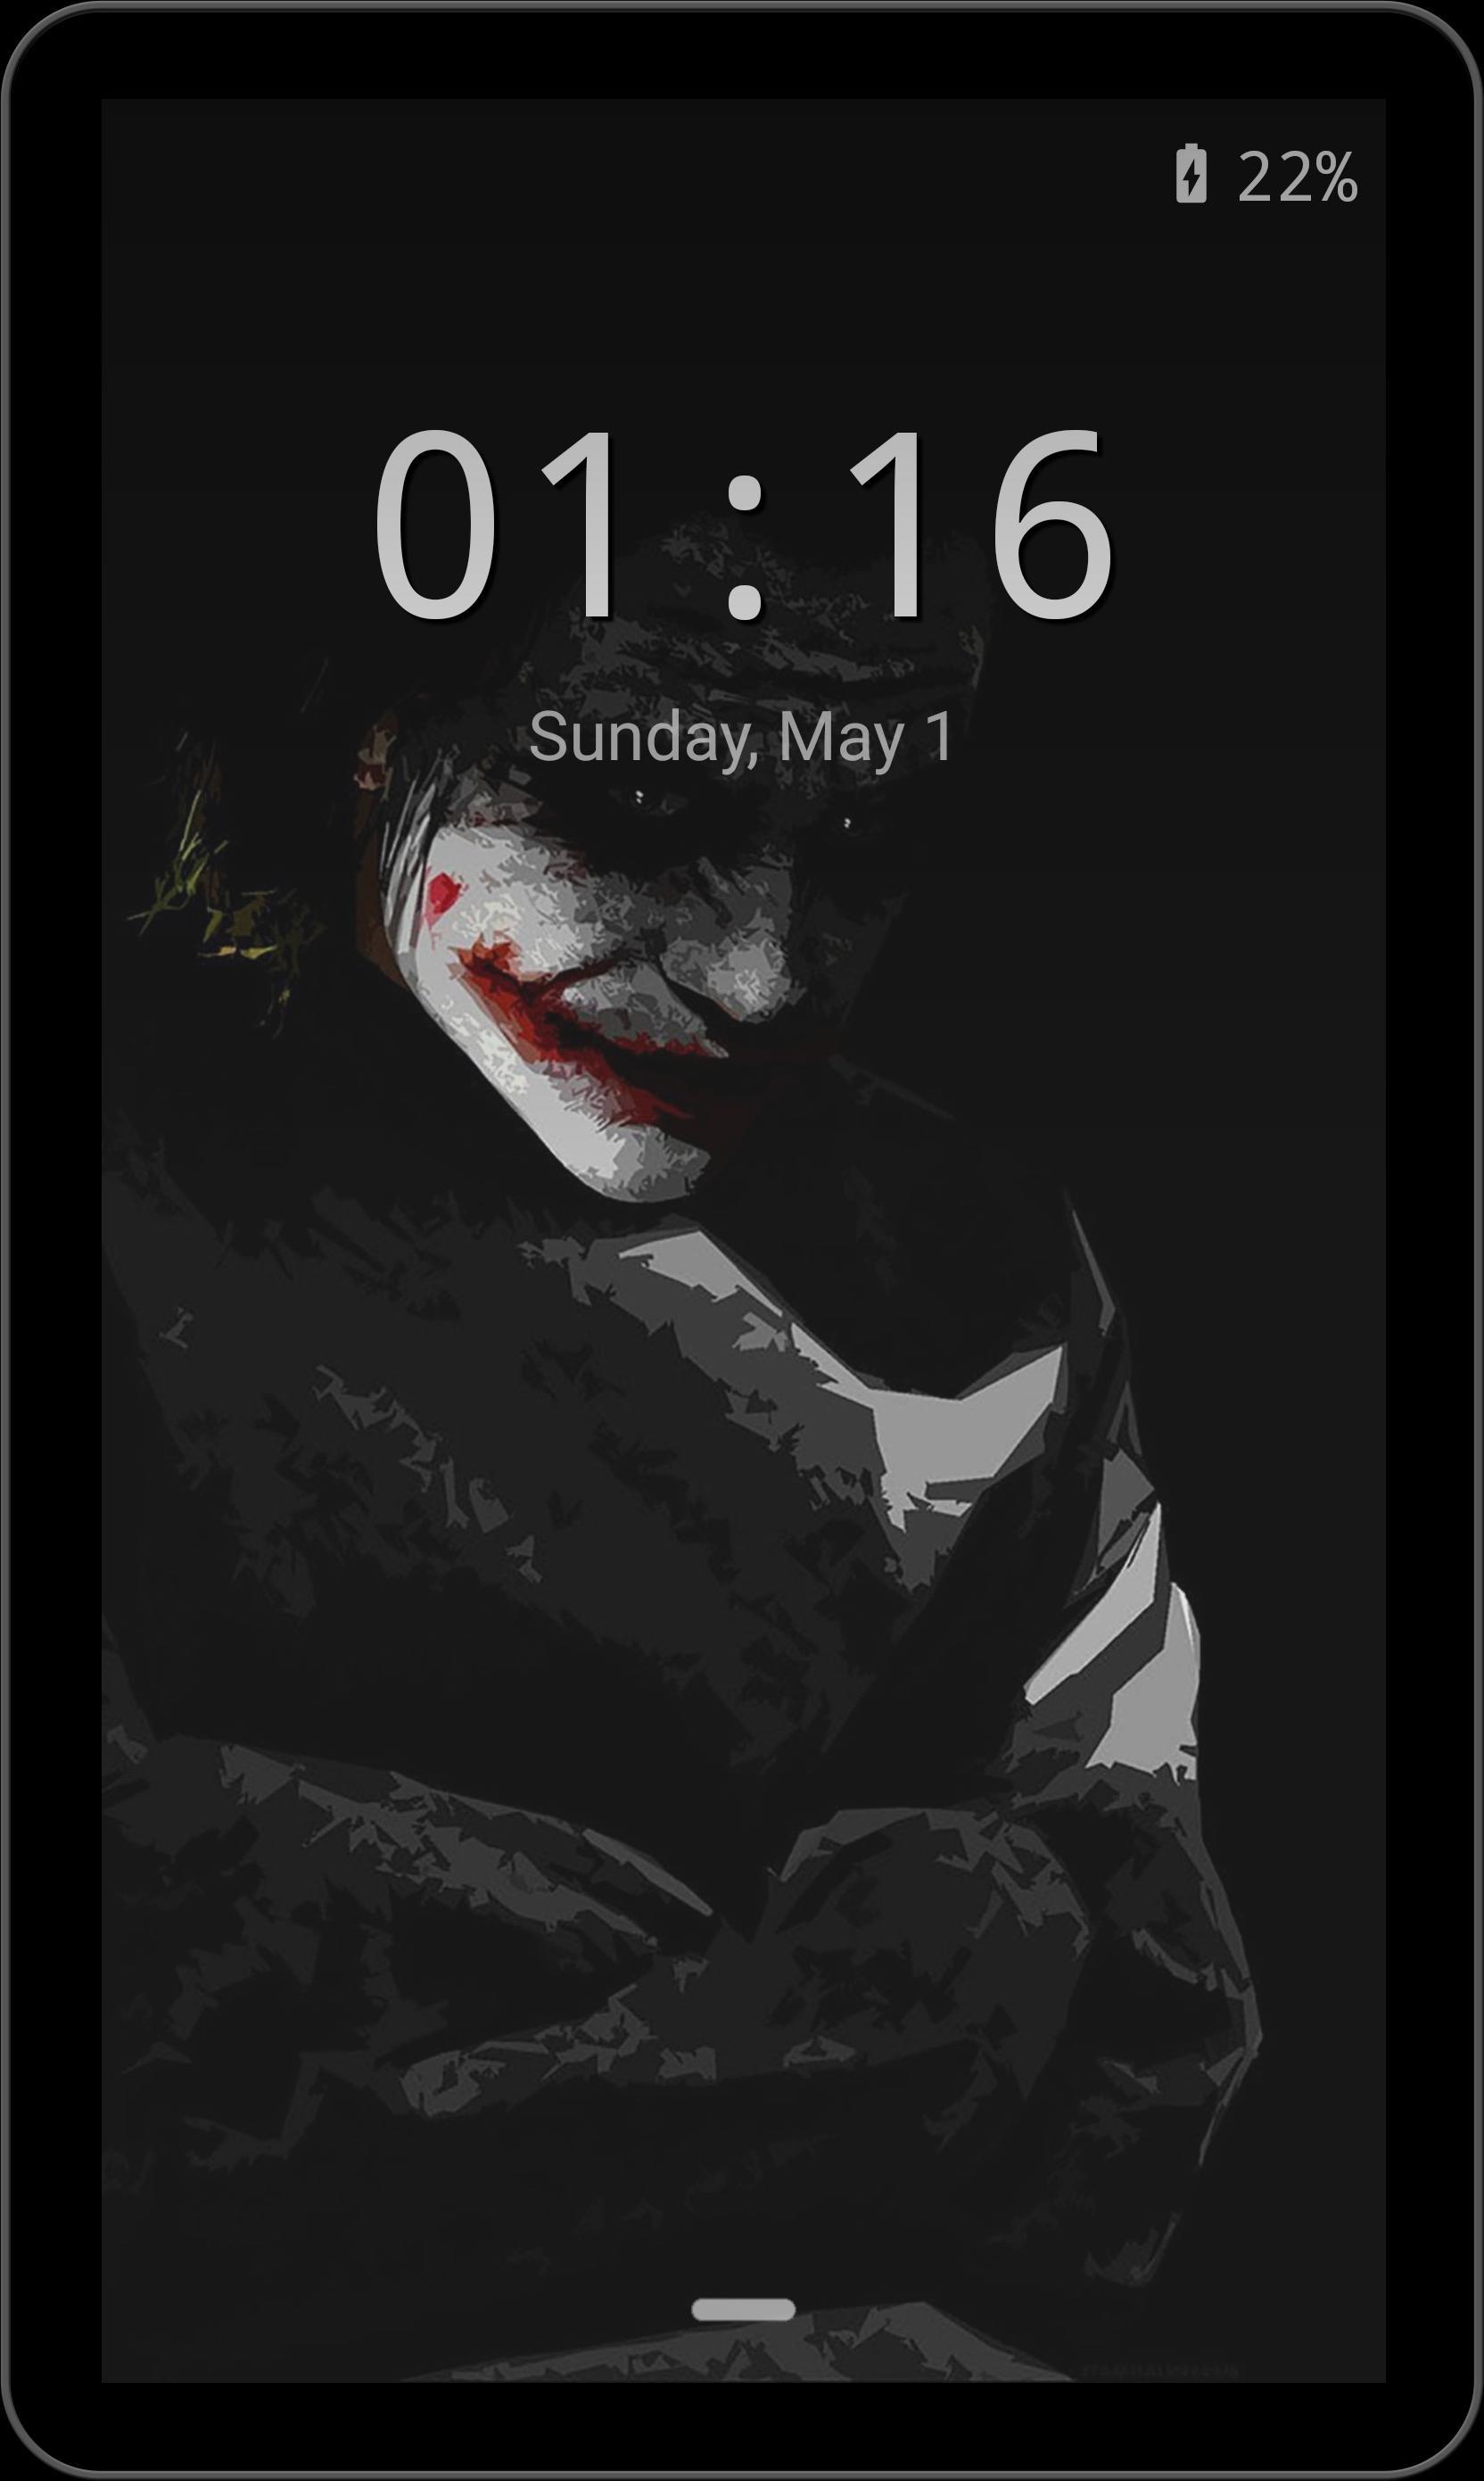 Joker Wallpaper 4k Lock Screen Joker Hd For Android Apk